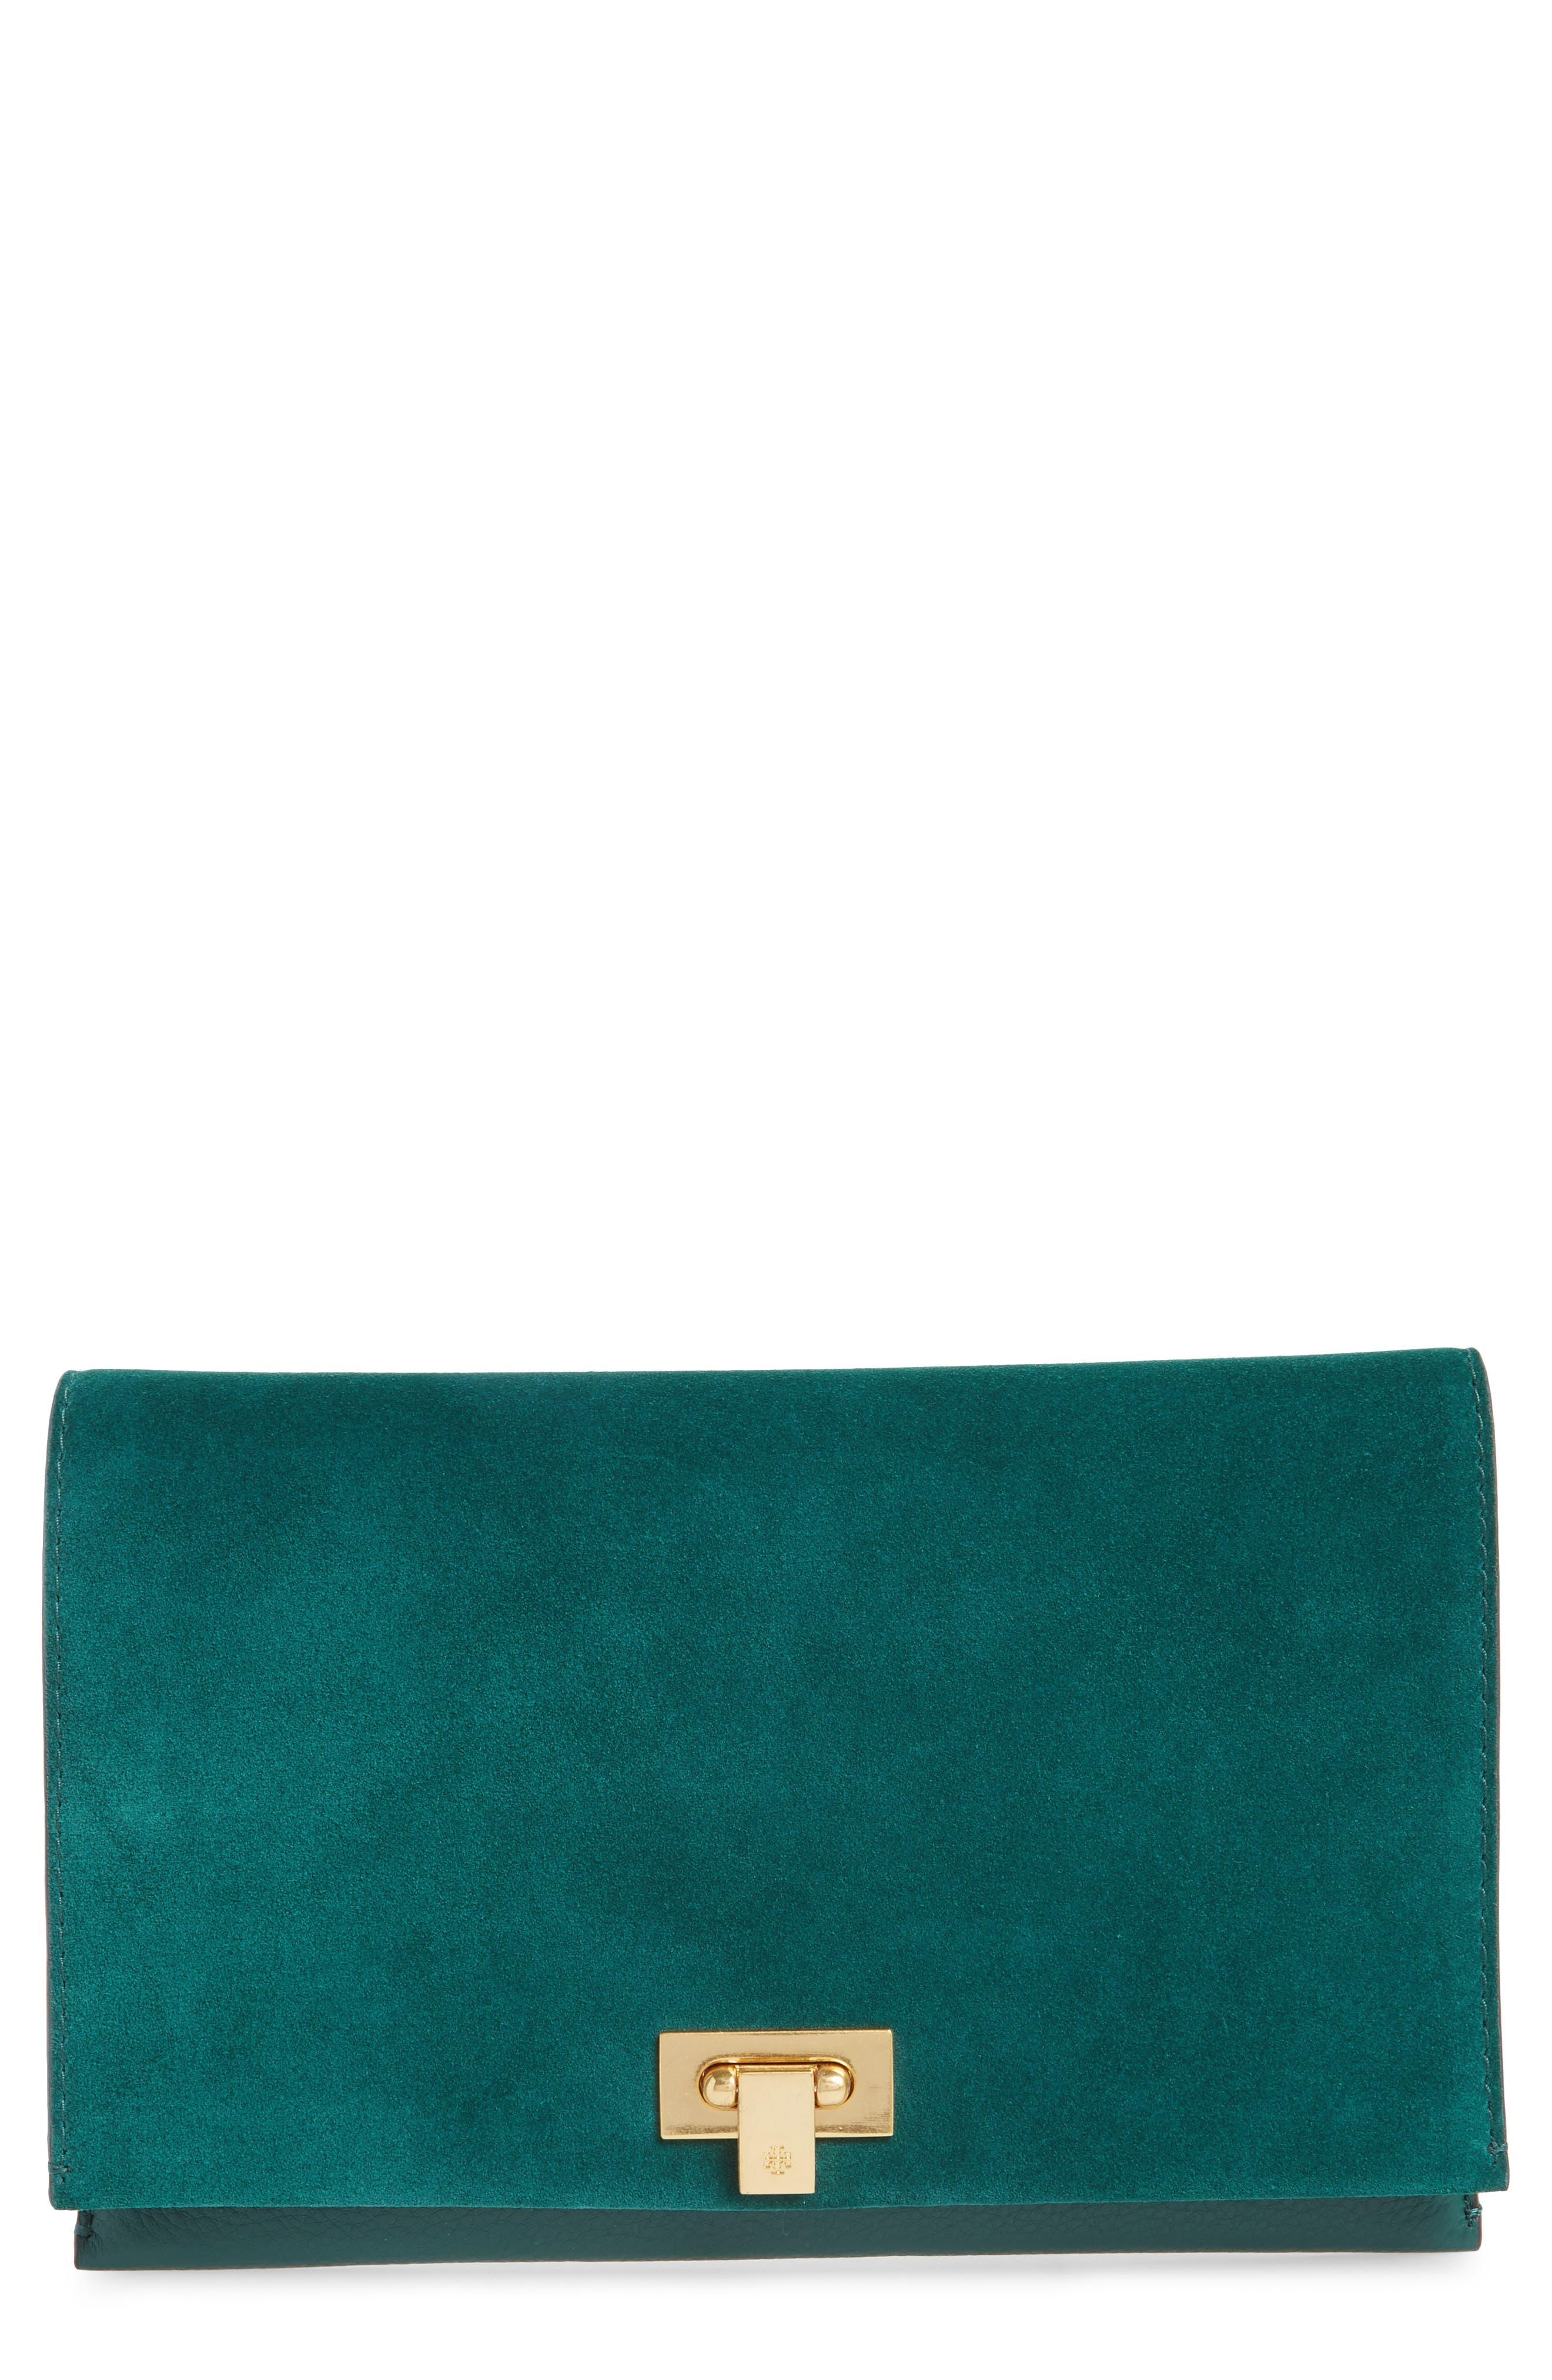 Carmen Leather Clutch,                         Main,                         color, 318